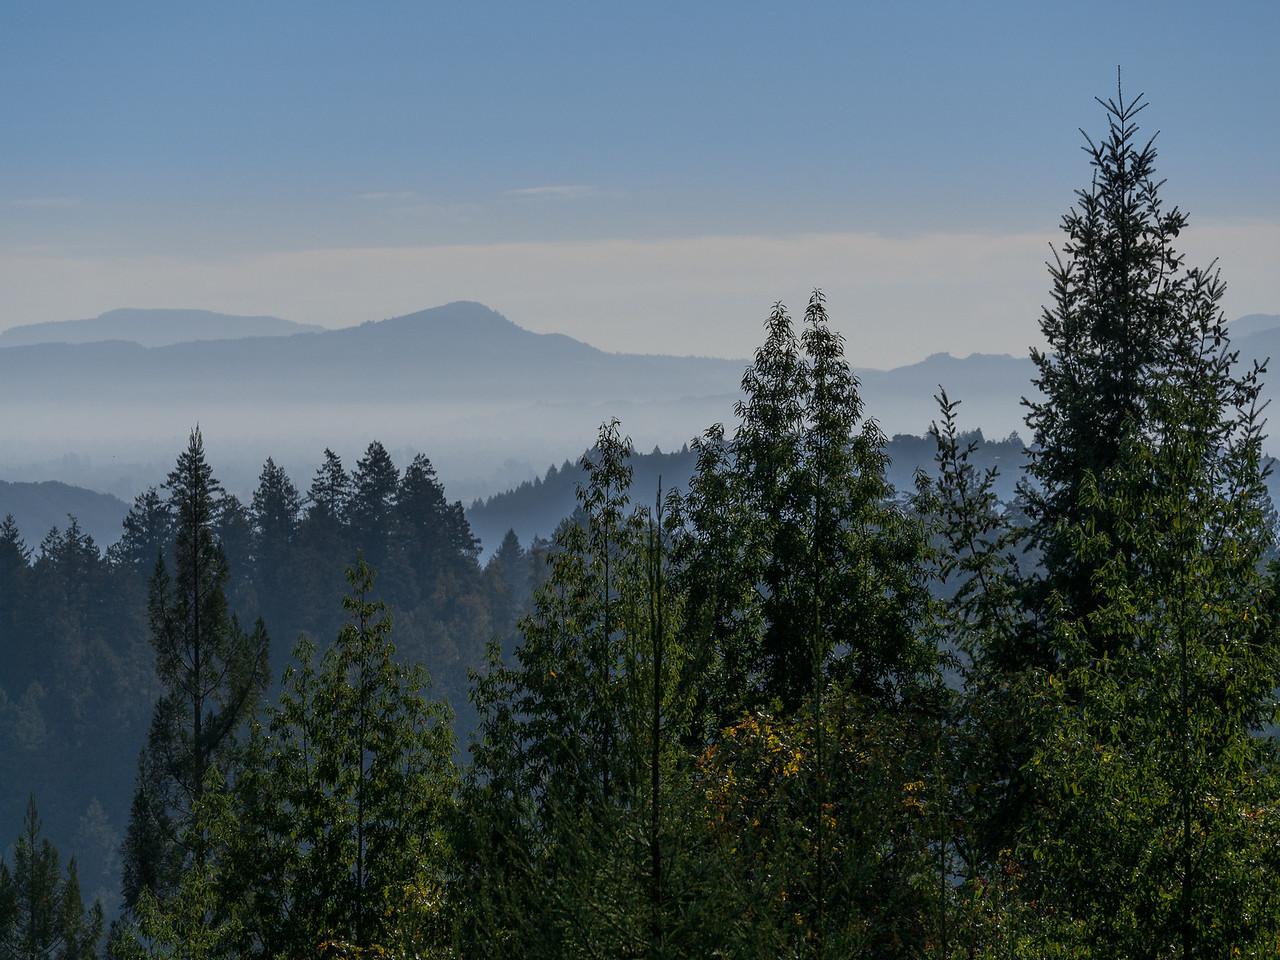 California Mountains in Fog